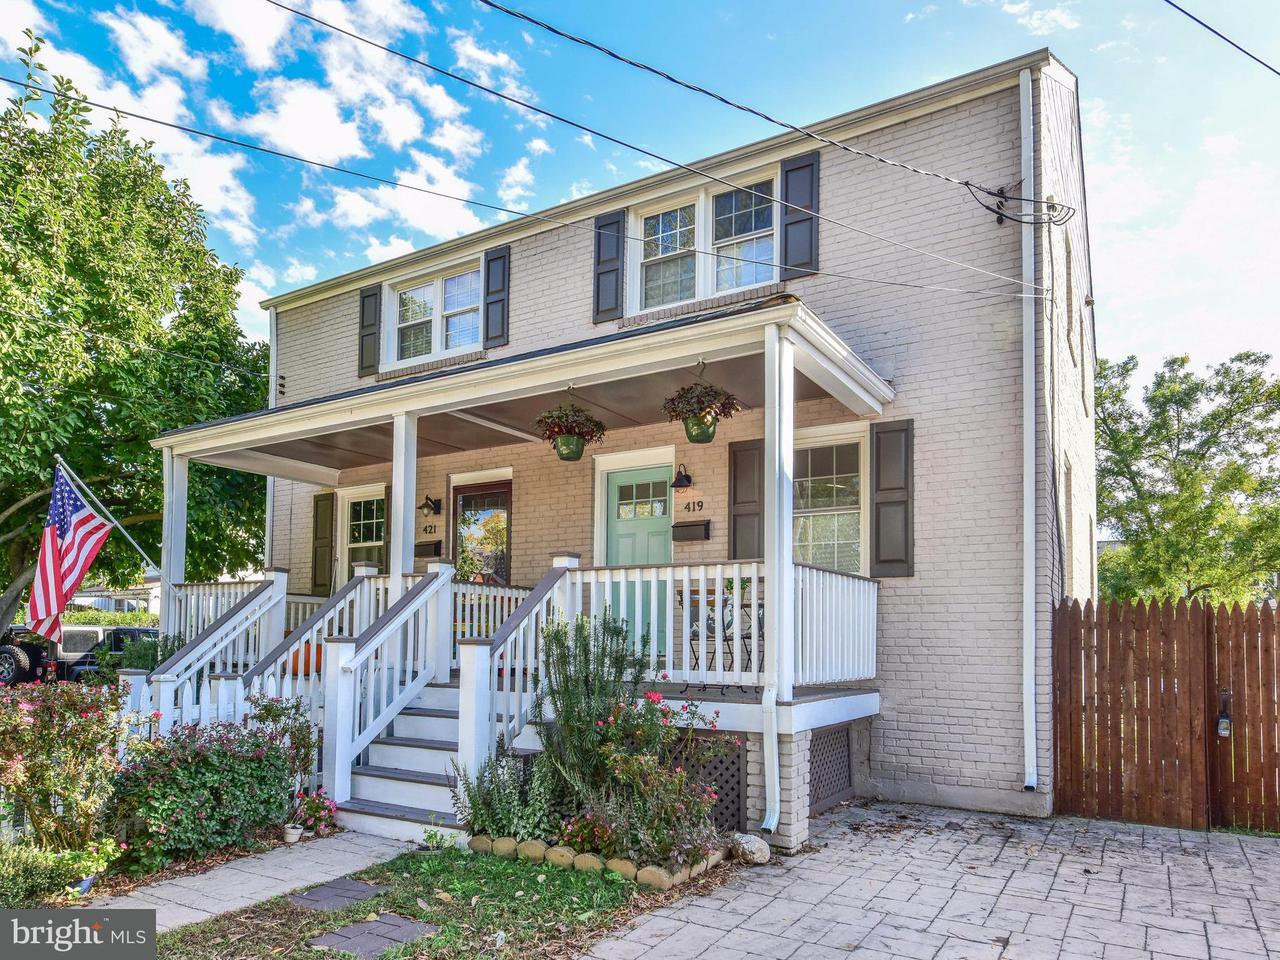 Doppelhaus für Verkauf beim 419 DEL RAY AVE E 419 DEL RAY AVE E Alexandria, Virginia 22301 Vereinigte Staaten